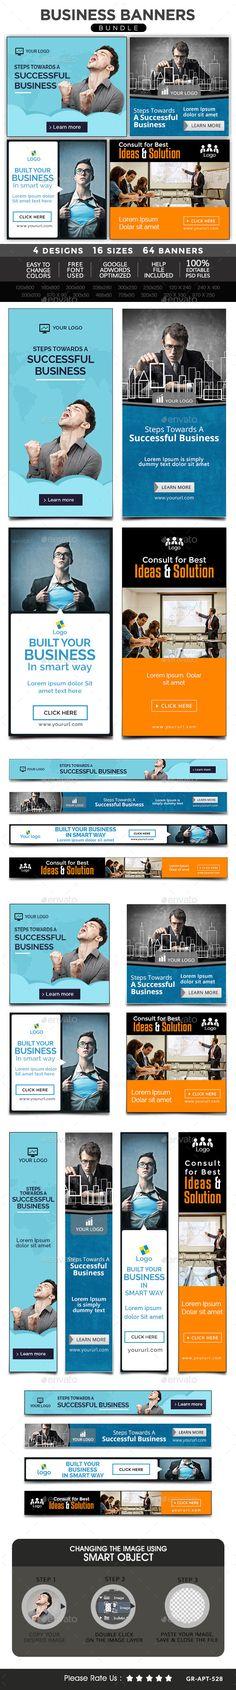 Business Banners Bundle - 4 Sets Download: http://graphicriver.net/item/business-banners-bundle-4-sets/11017268?ref=ksioks